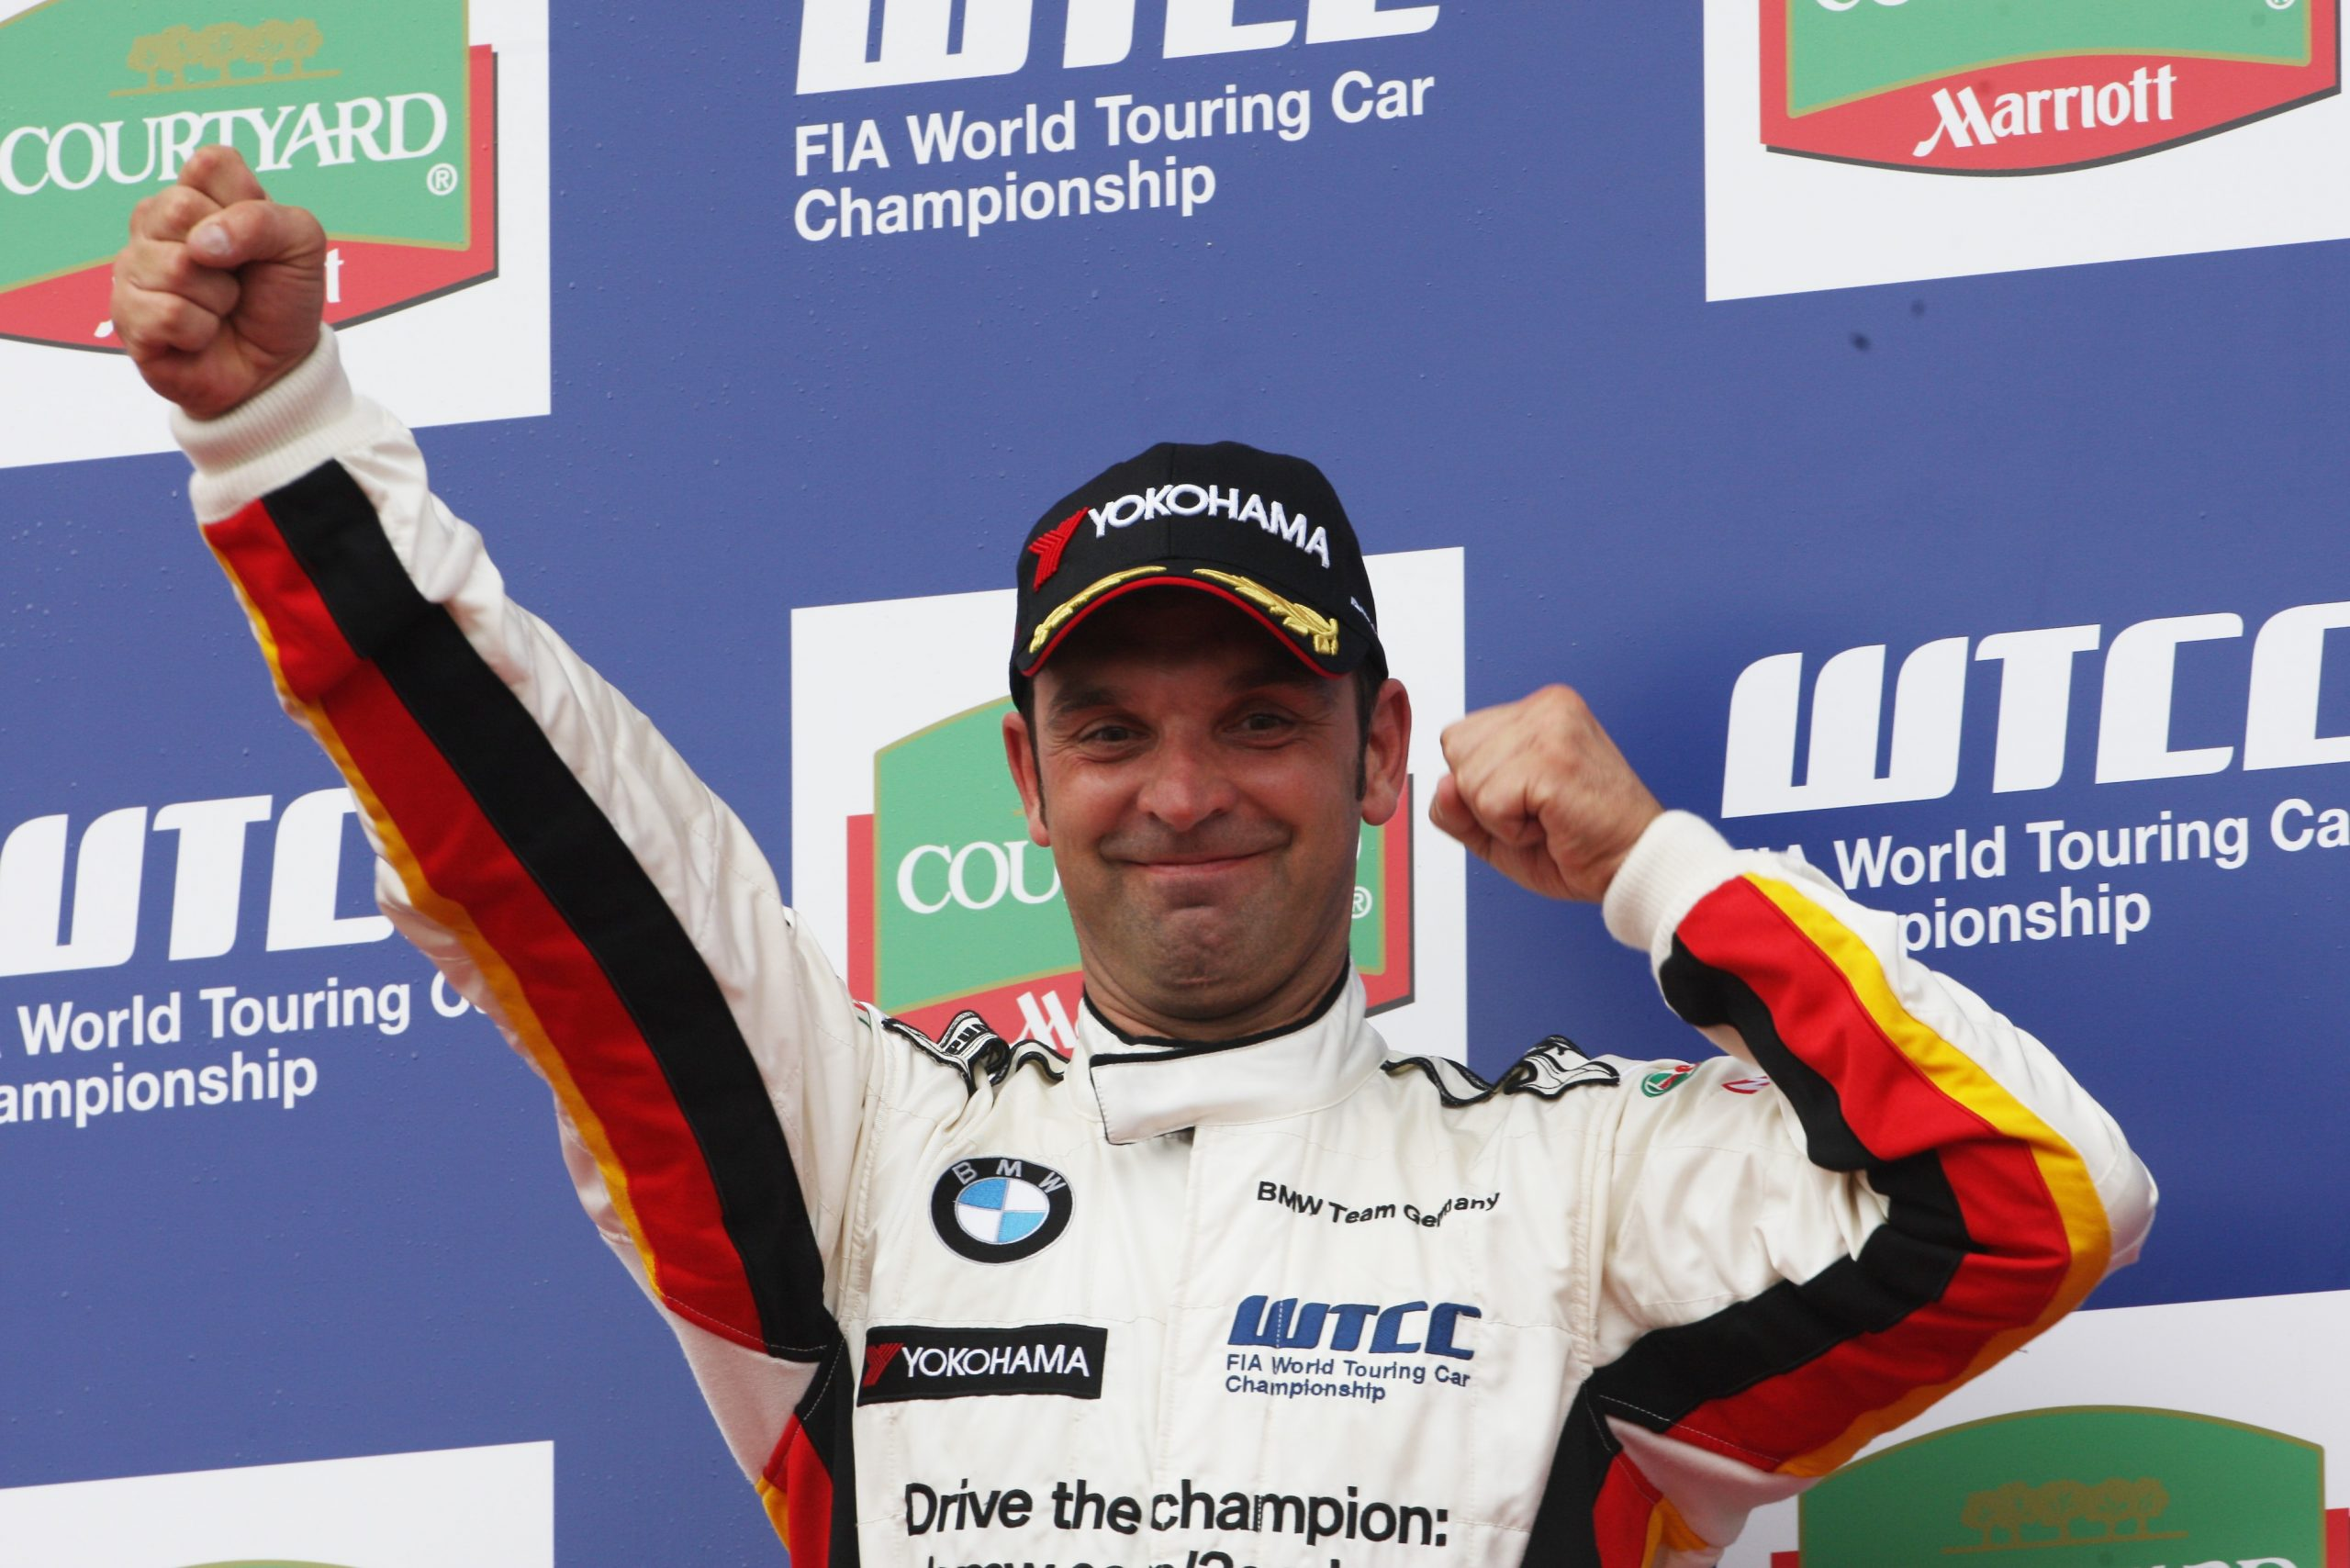 Jorg Muller, WTCC Imola 2008